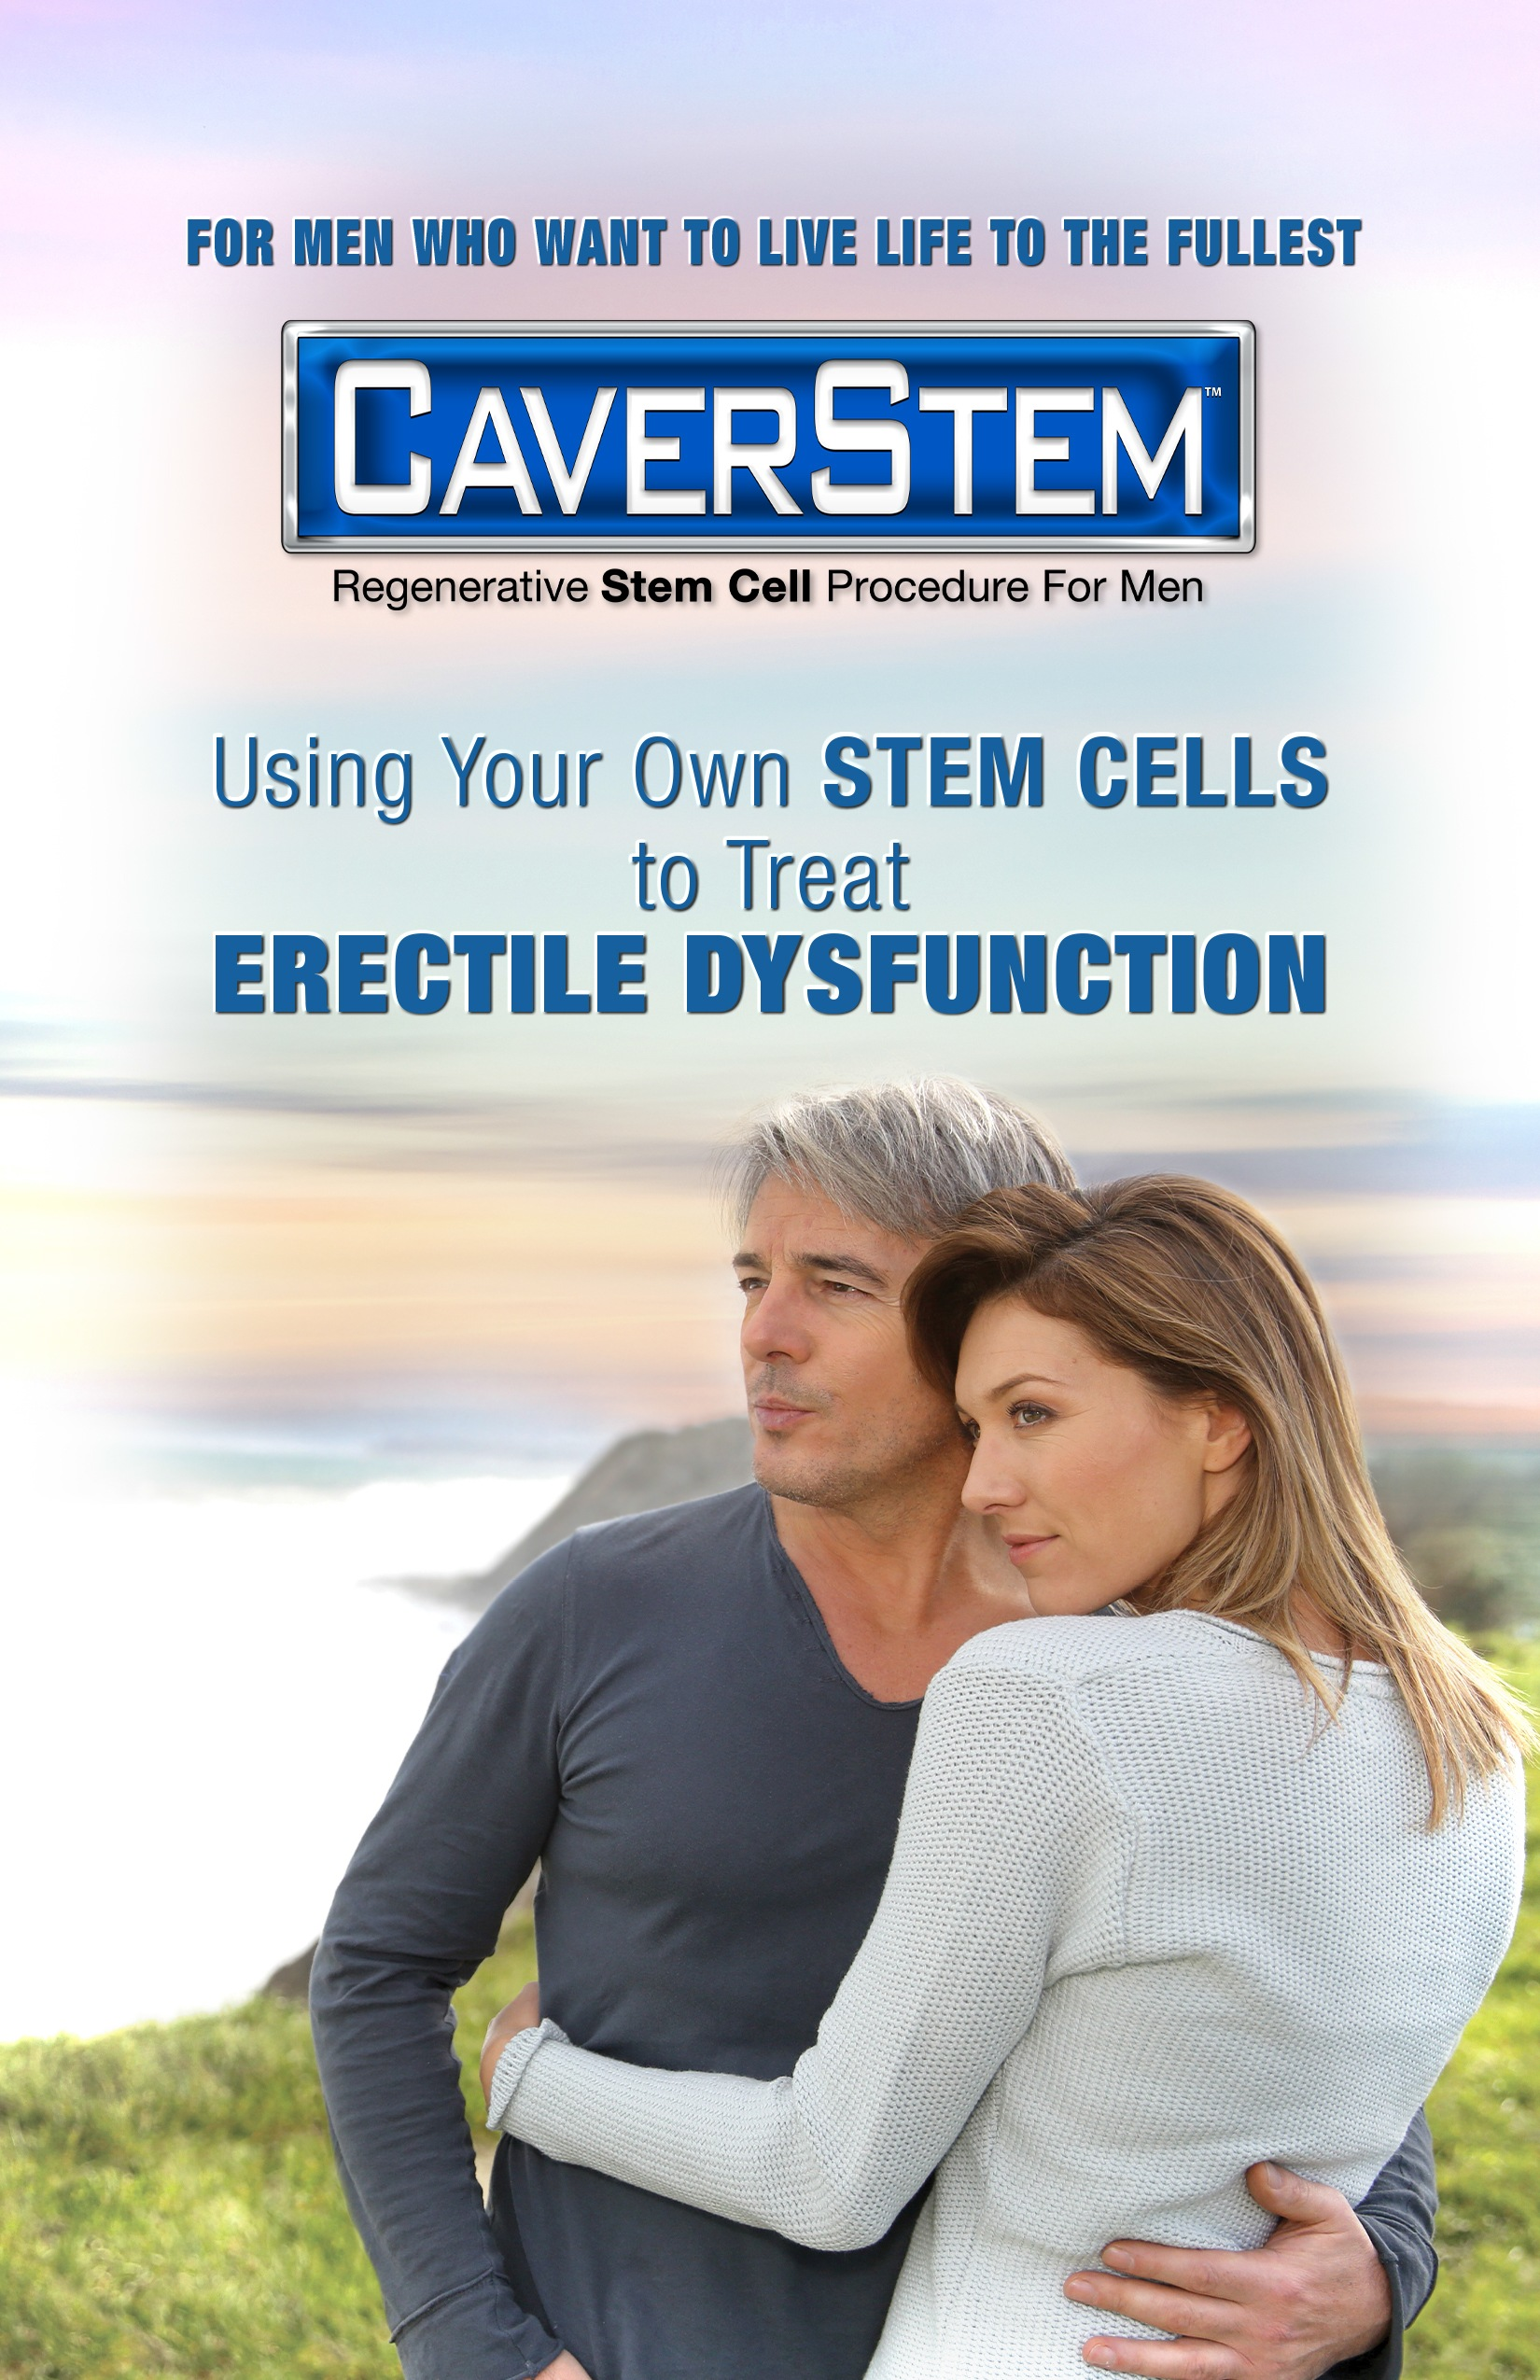 CaverStem Brochure 2019 1 1